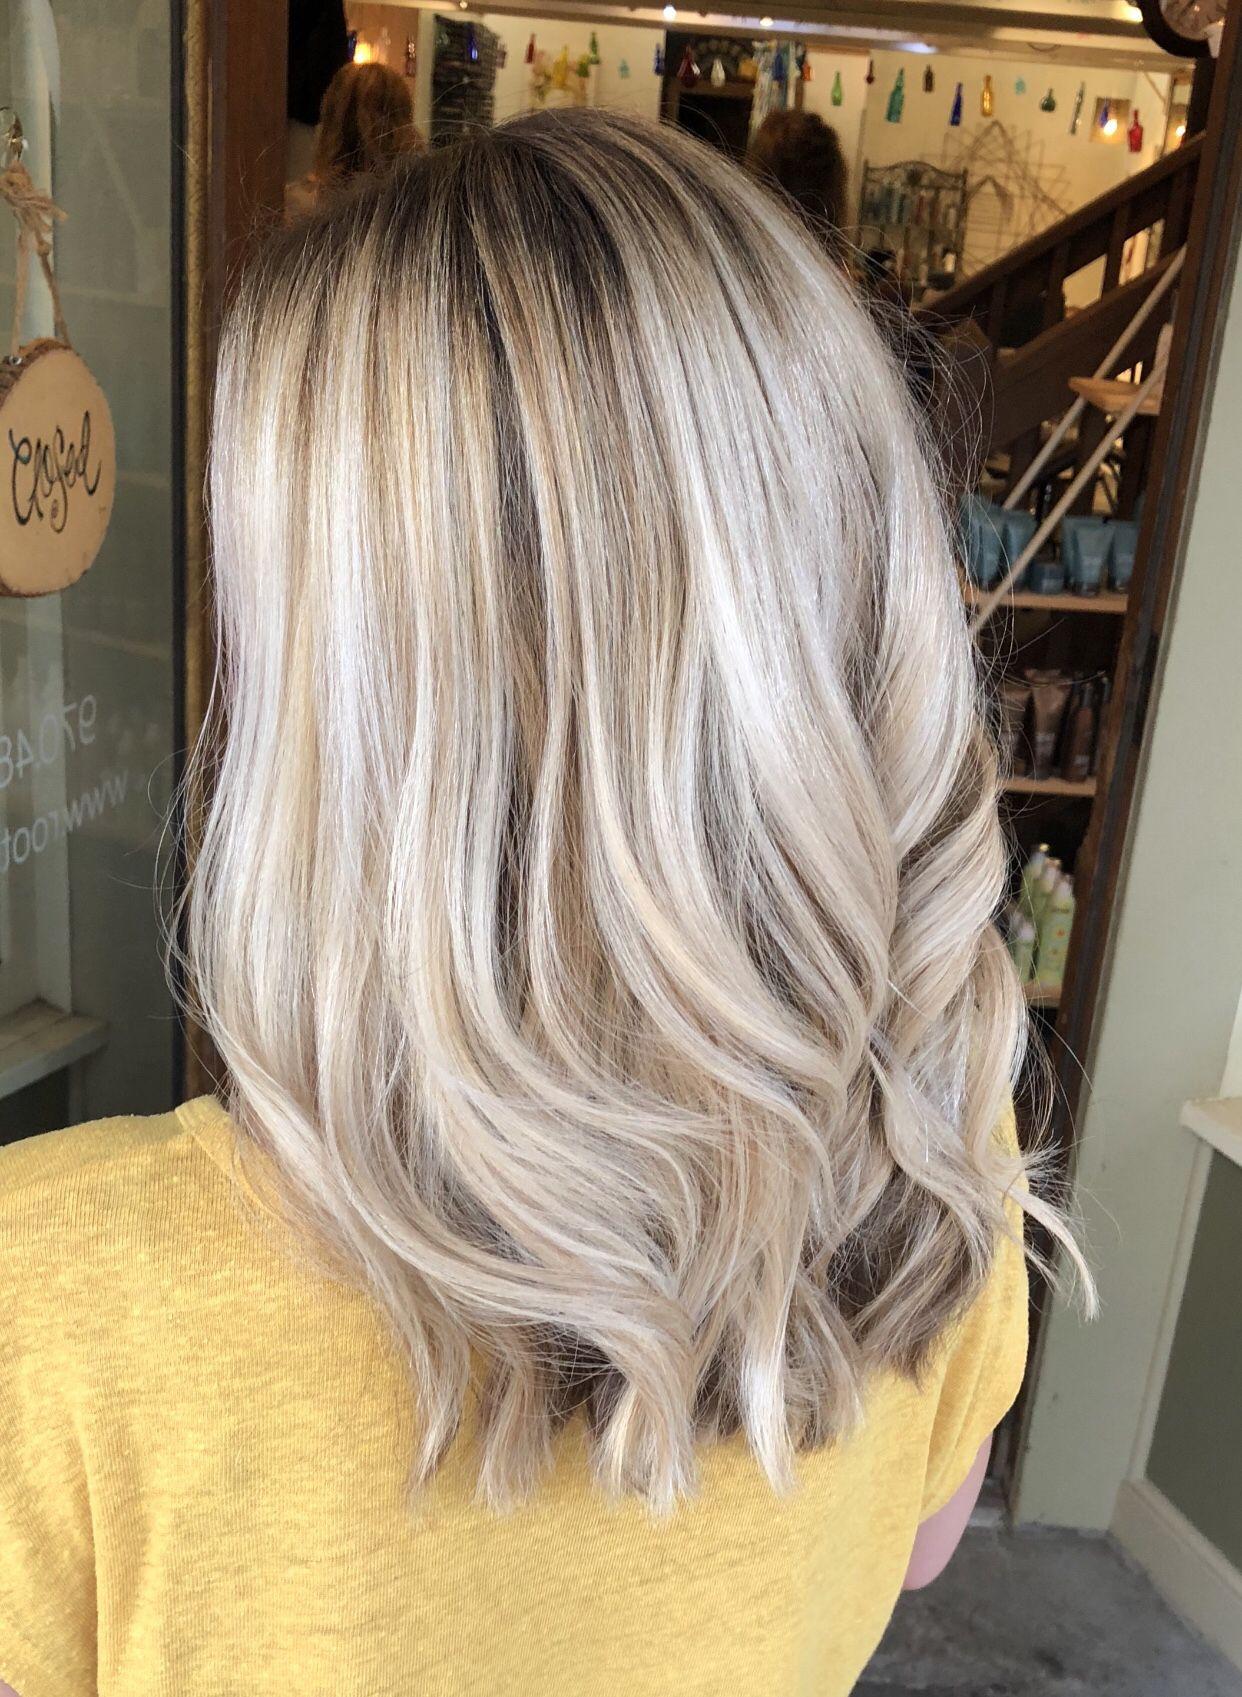 Blonde Hair Bright Blonde Hair Light Blonde Hair Creamy Blonde